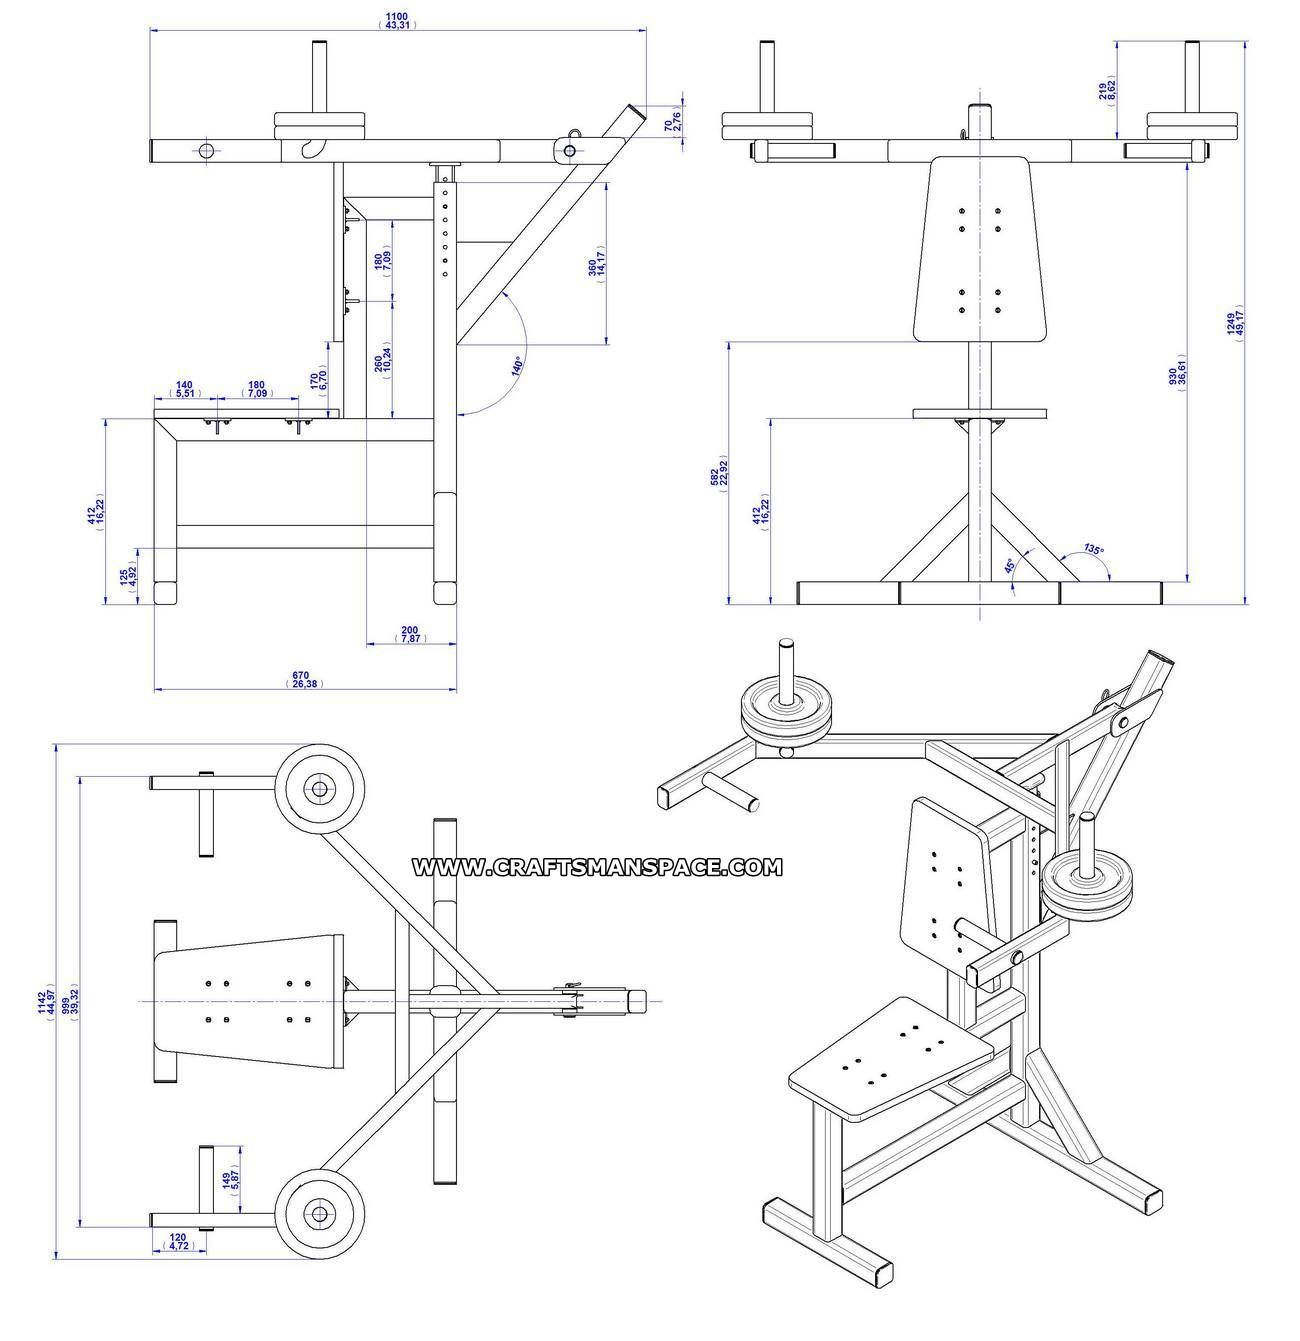 Shoulder press bench plan assembly drawing